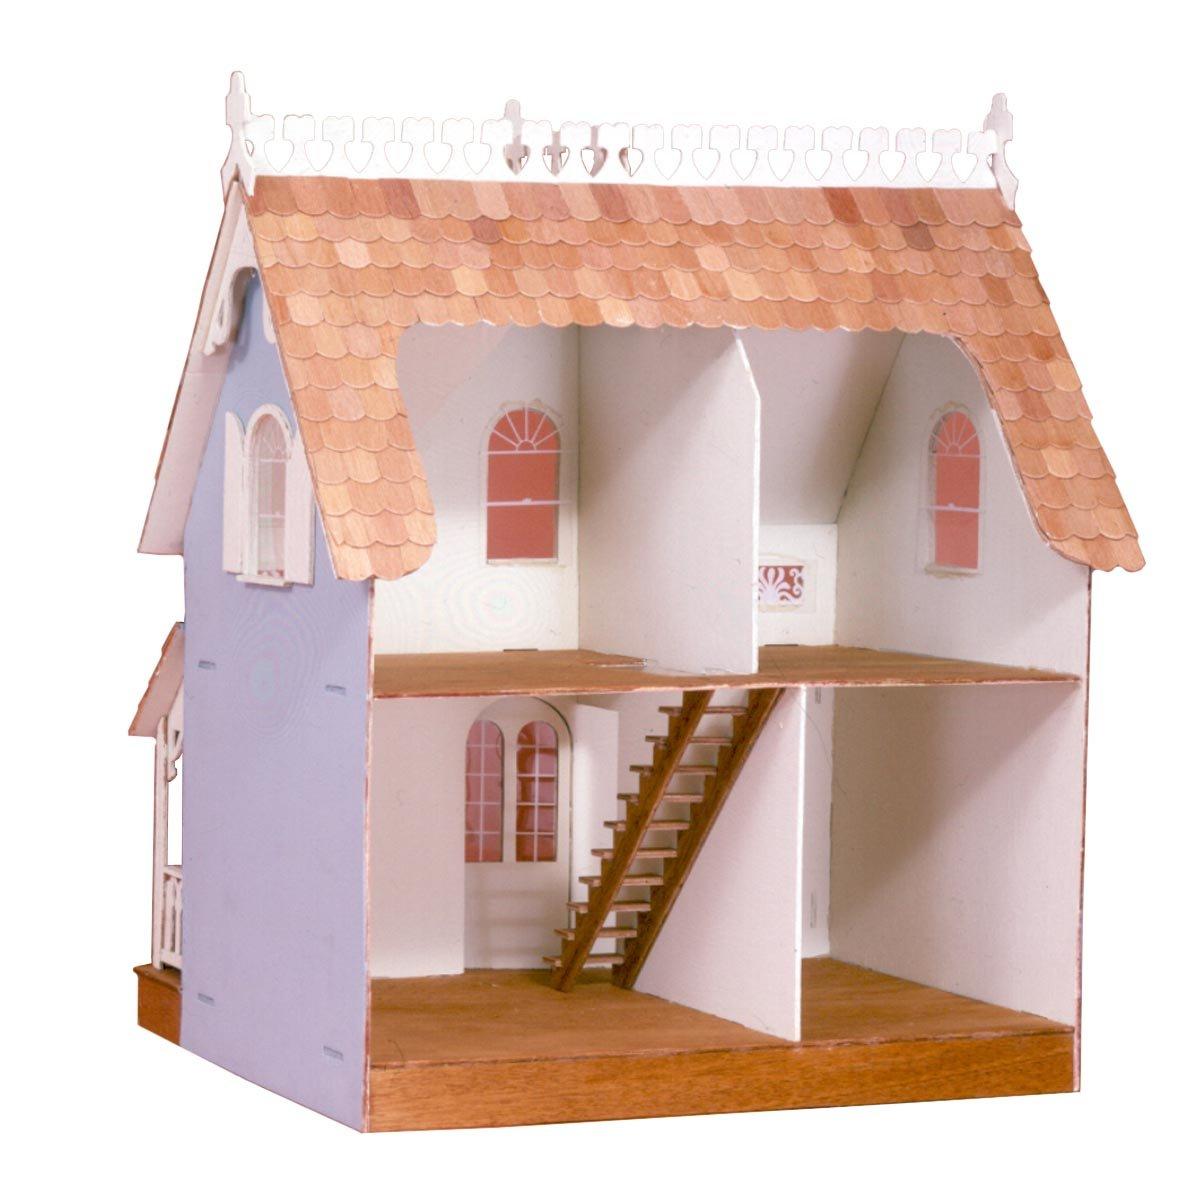 skarla 39 s variety shop deals 2 story cute dollhouse